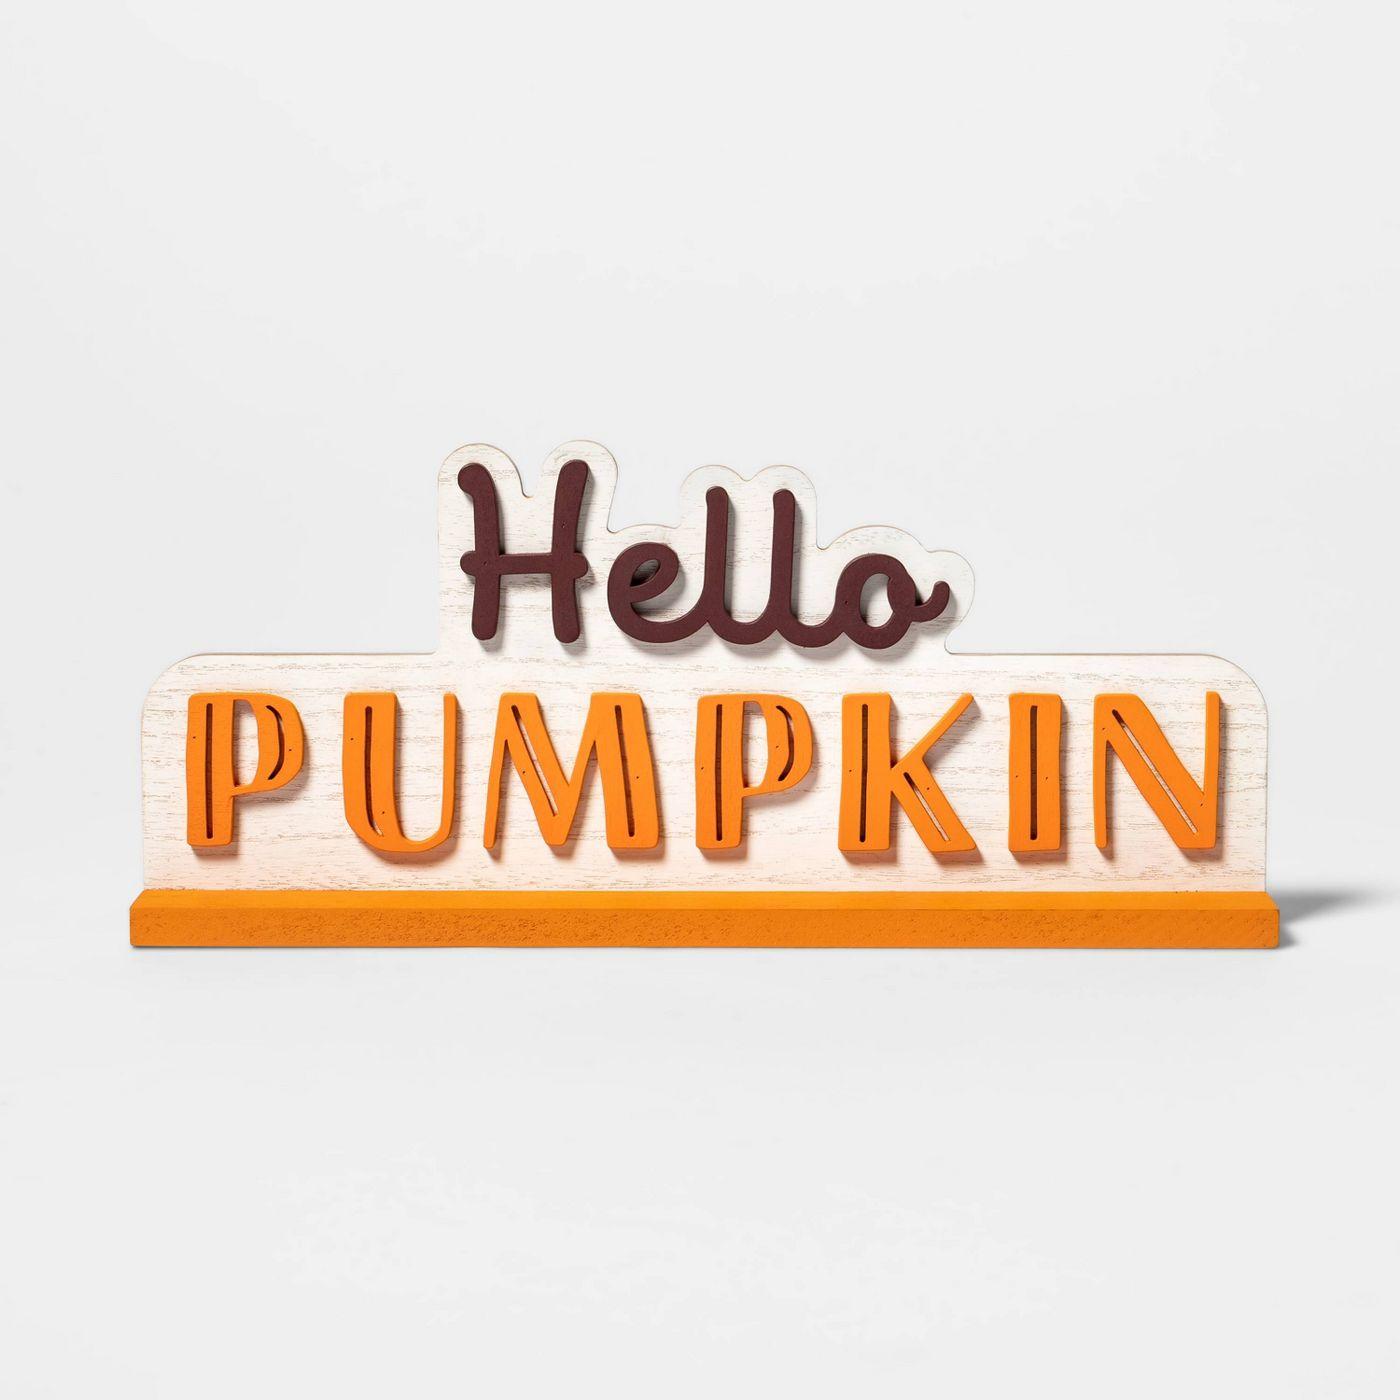 Hello Pumpkin Decorative Halloween Sign - Spritz™ - image 1 of 1